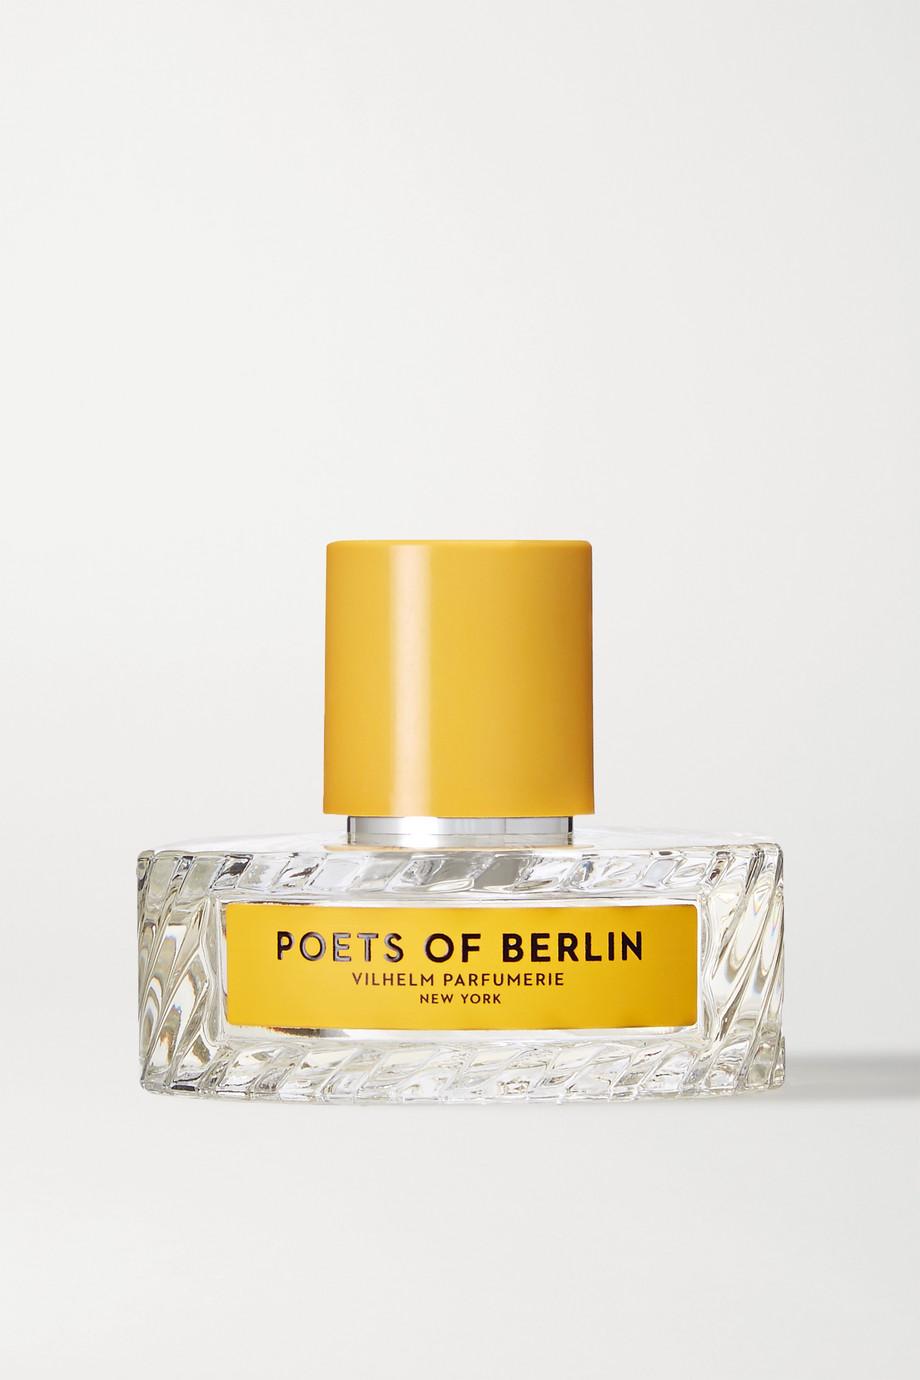 Vilhelm Parfumerie Eau de Parfum - Poets of Berlin, 50ml